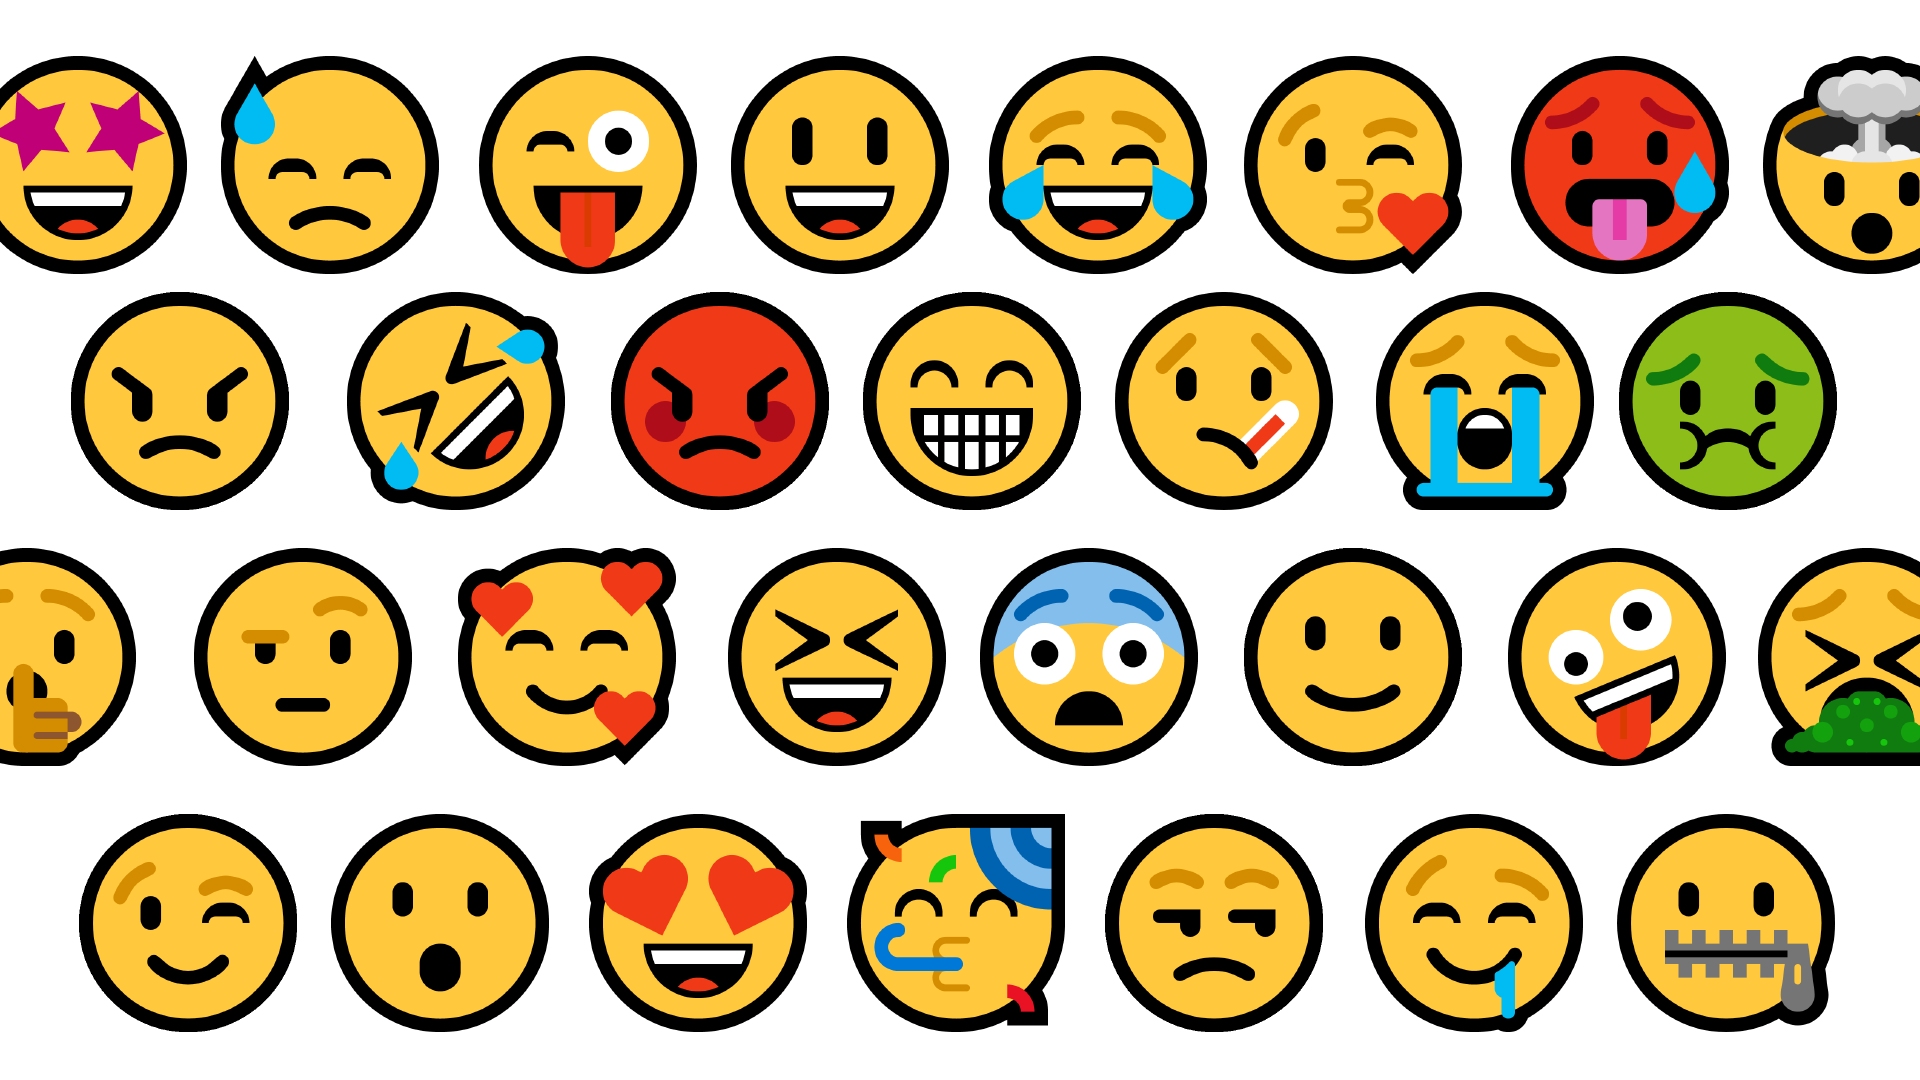 Emojipedia-Microsoft-July-2021-Comparison-Grid-Image